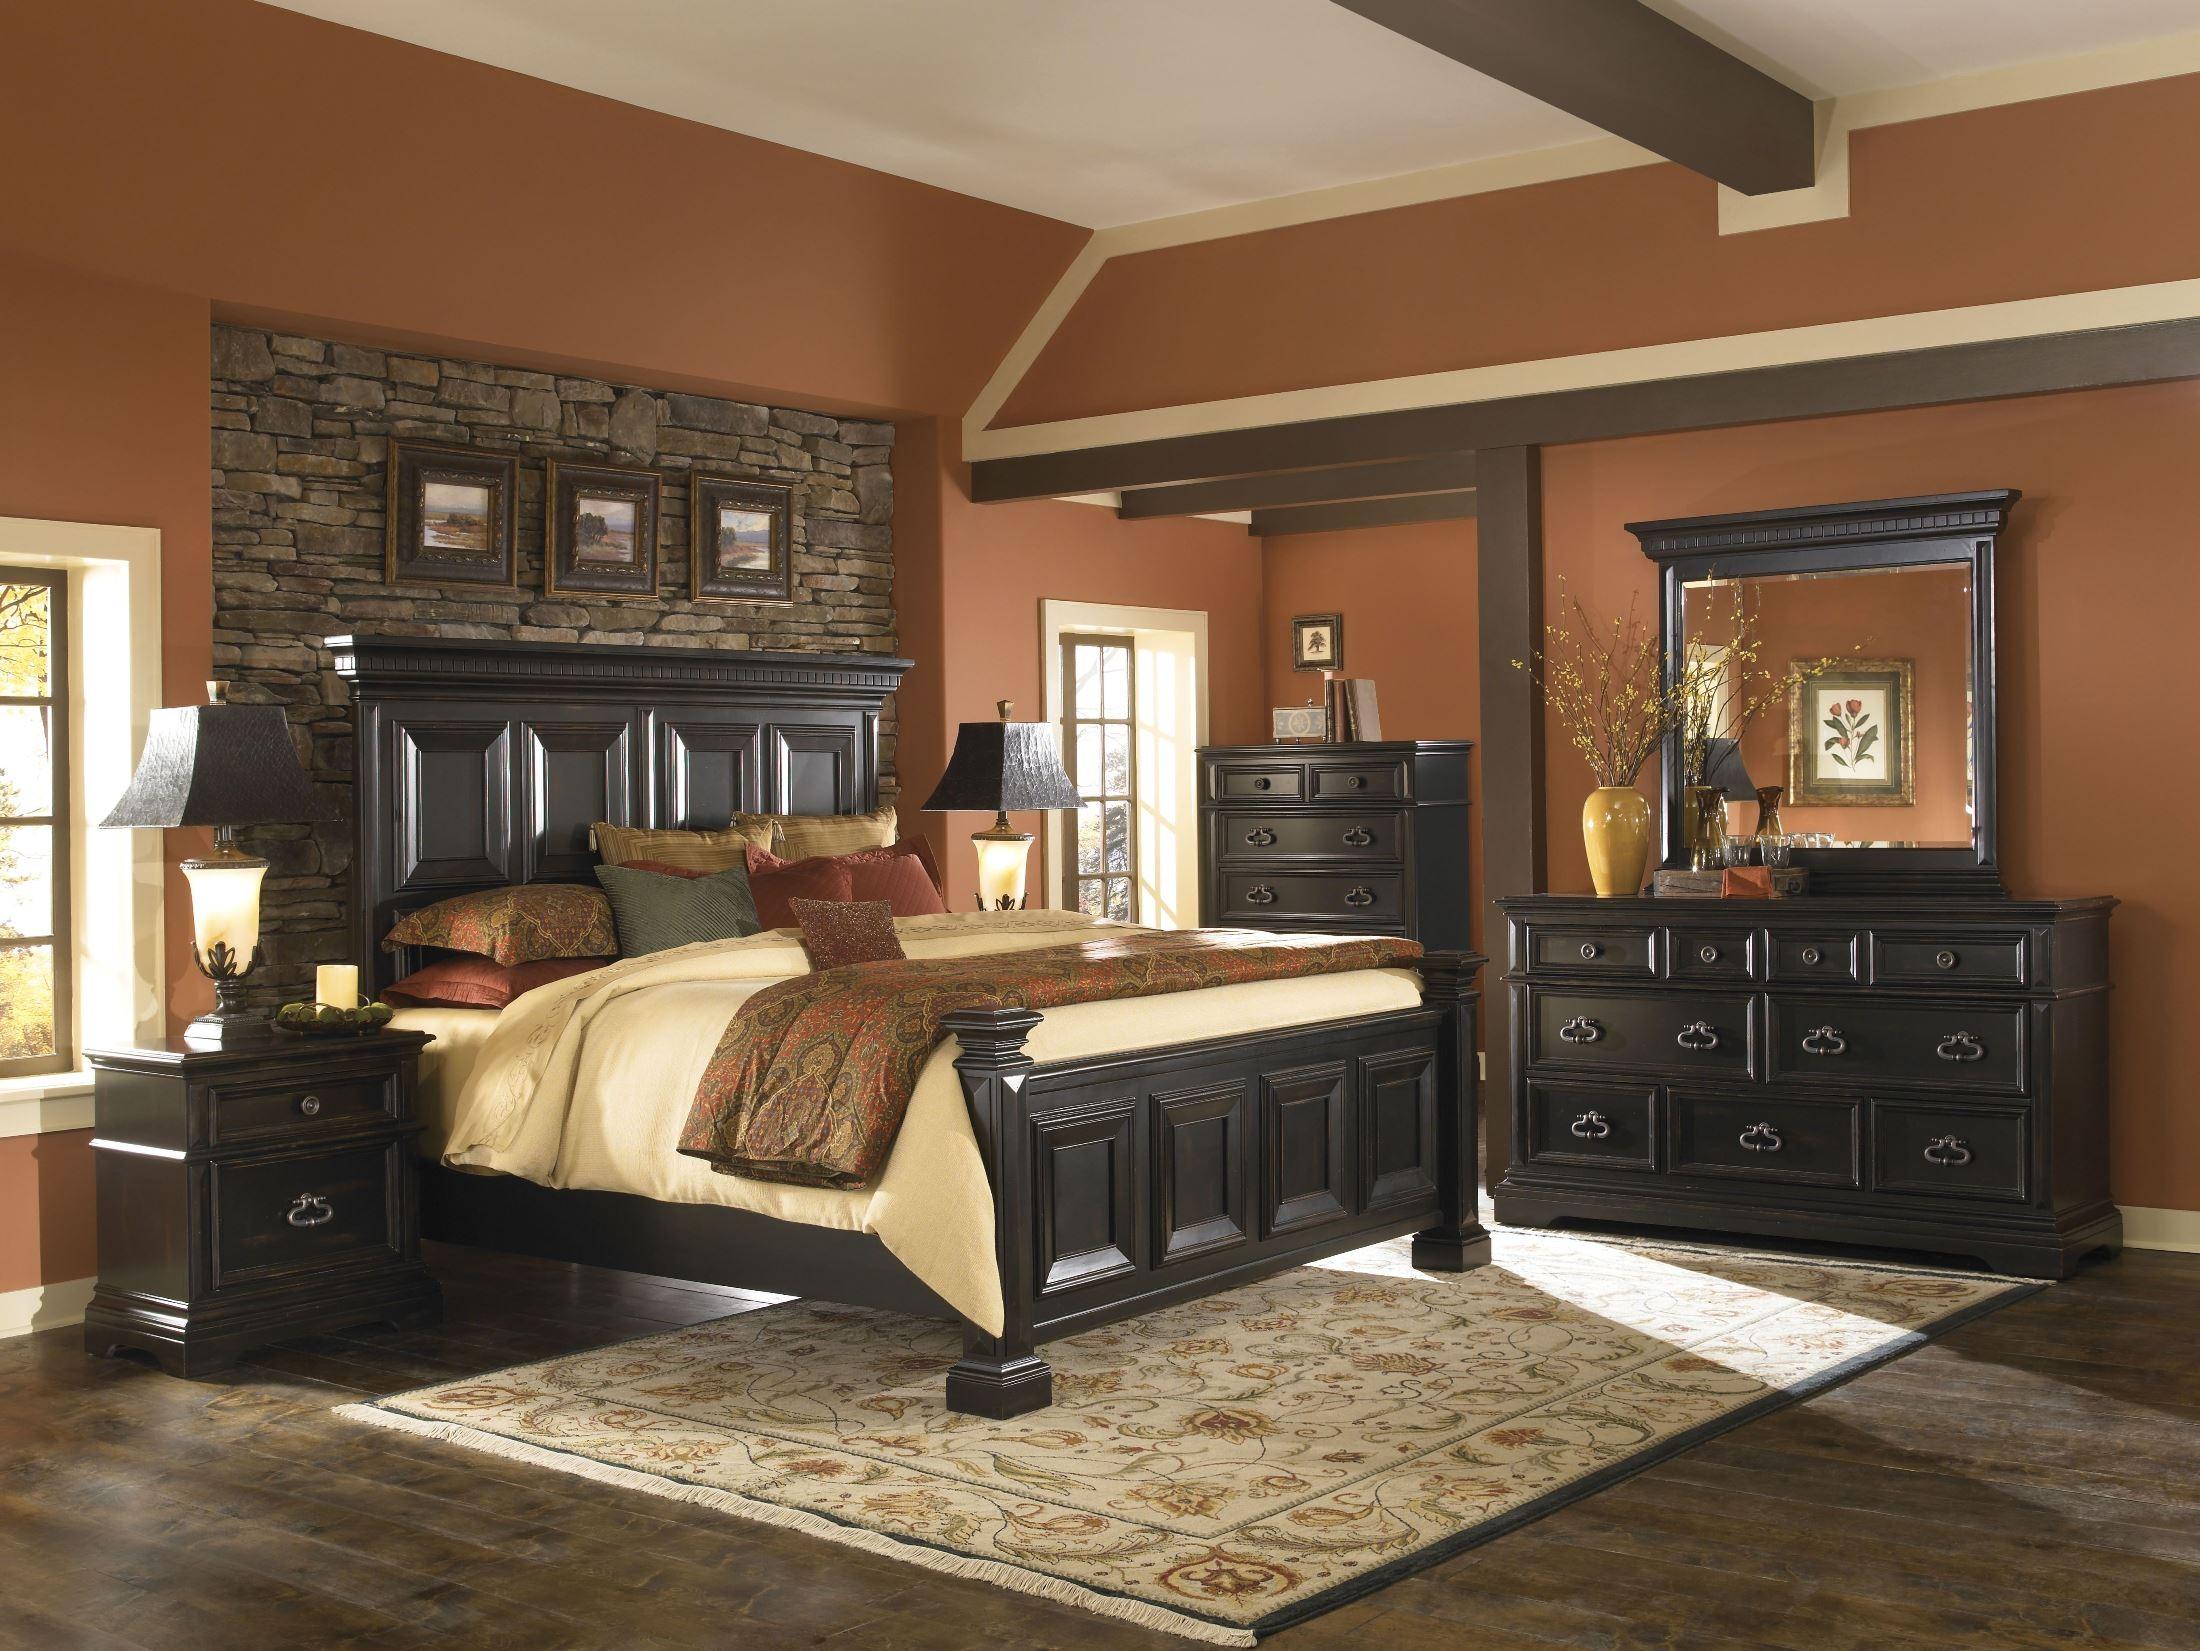 Brookfield Bedroom Set from Pulaski 9931